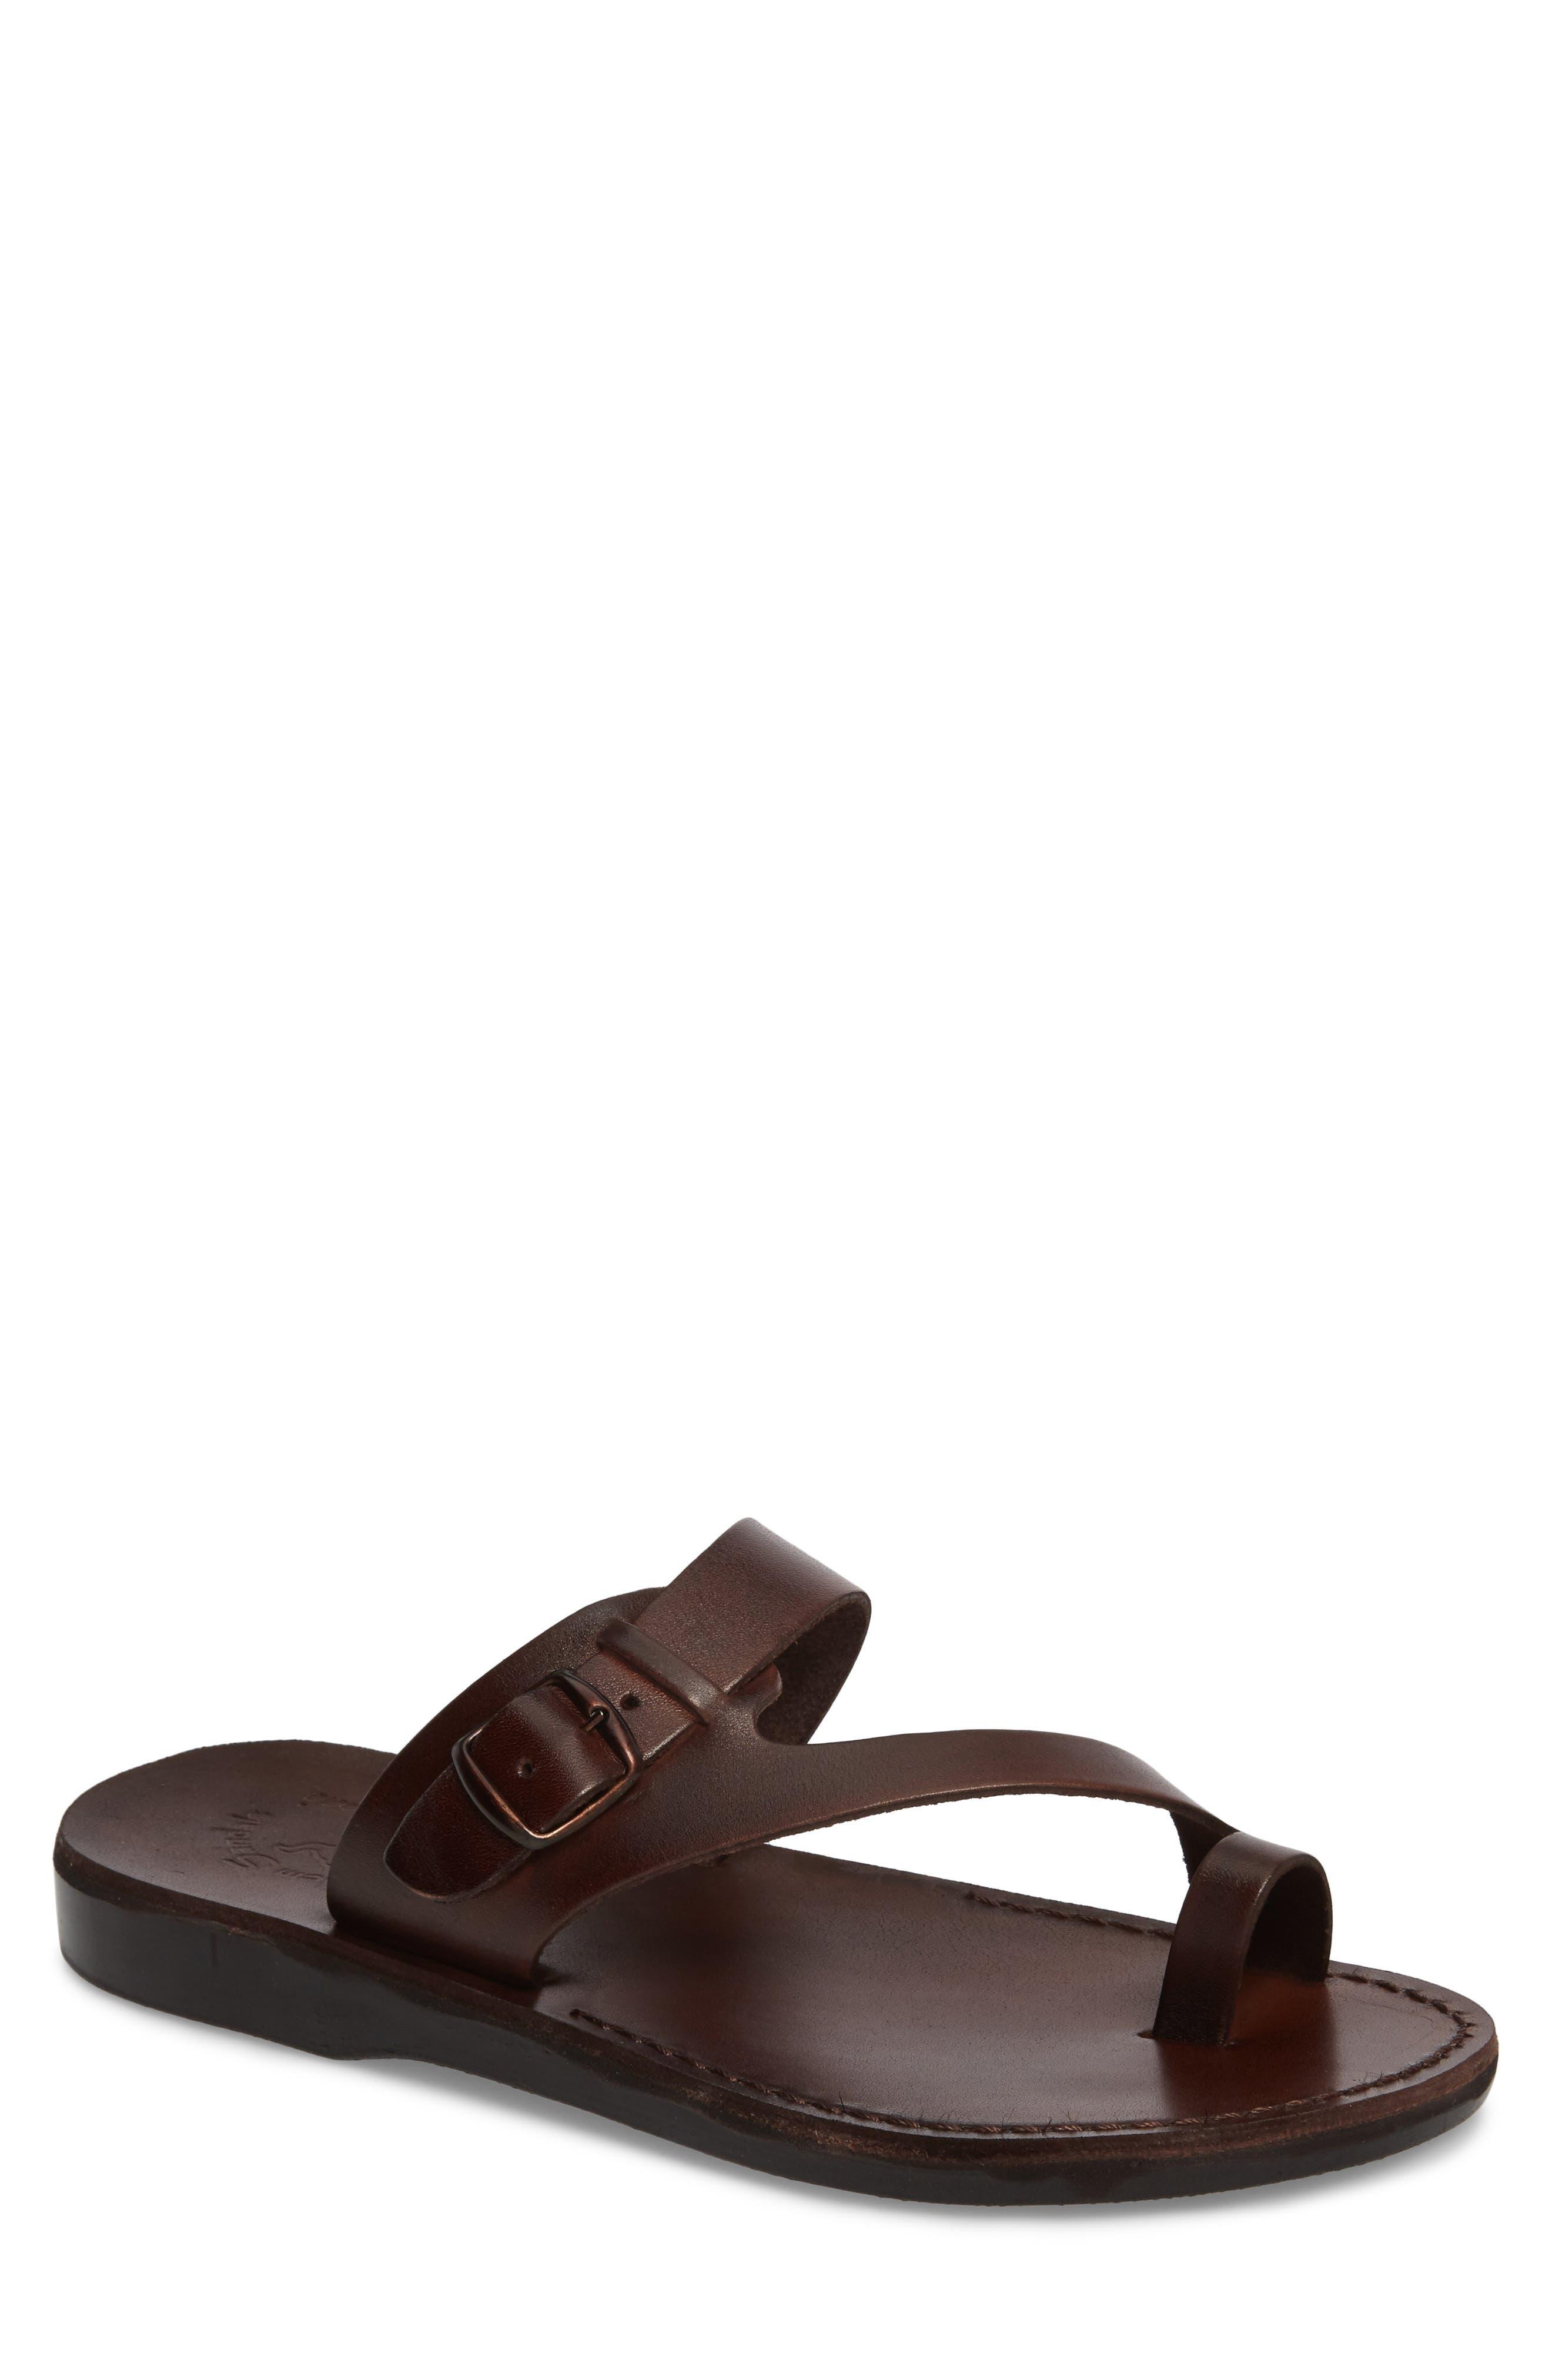 Abner Toe Loop Sandal